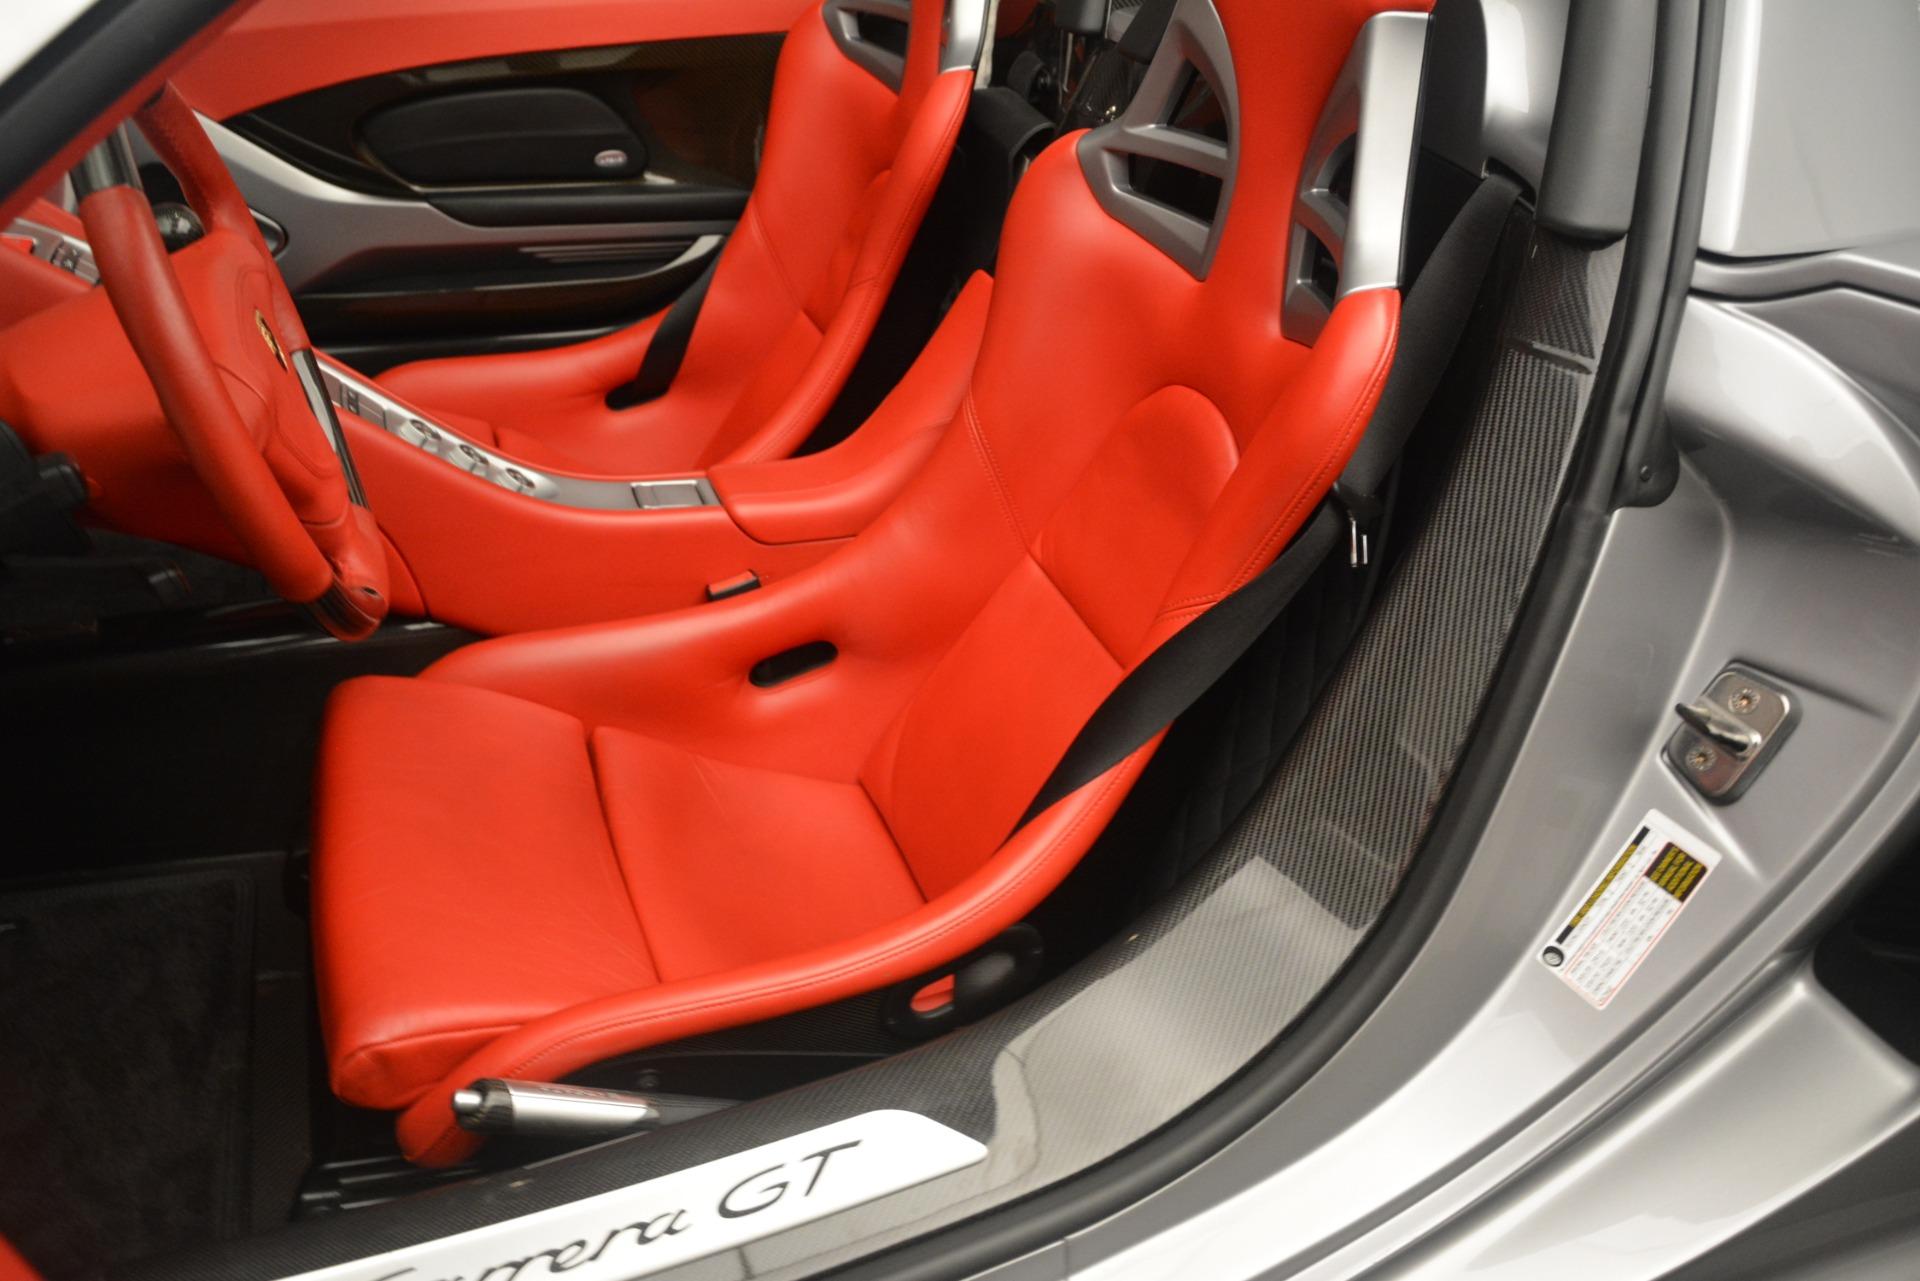 Used 2005 Porsche Carrera GT  For Sale In Greenwich, CT 3161_p25